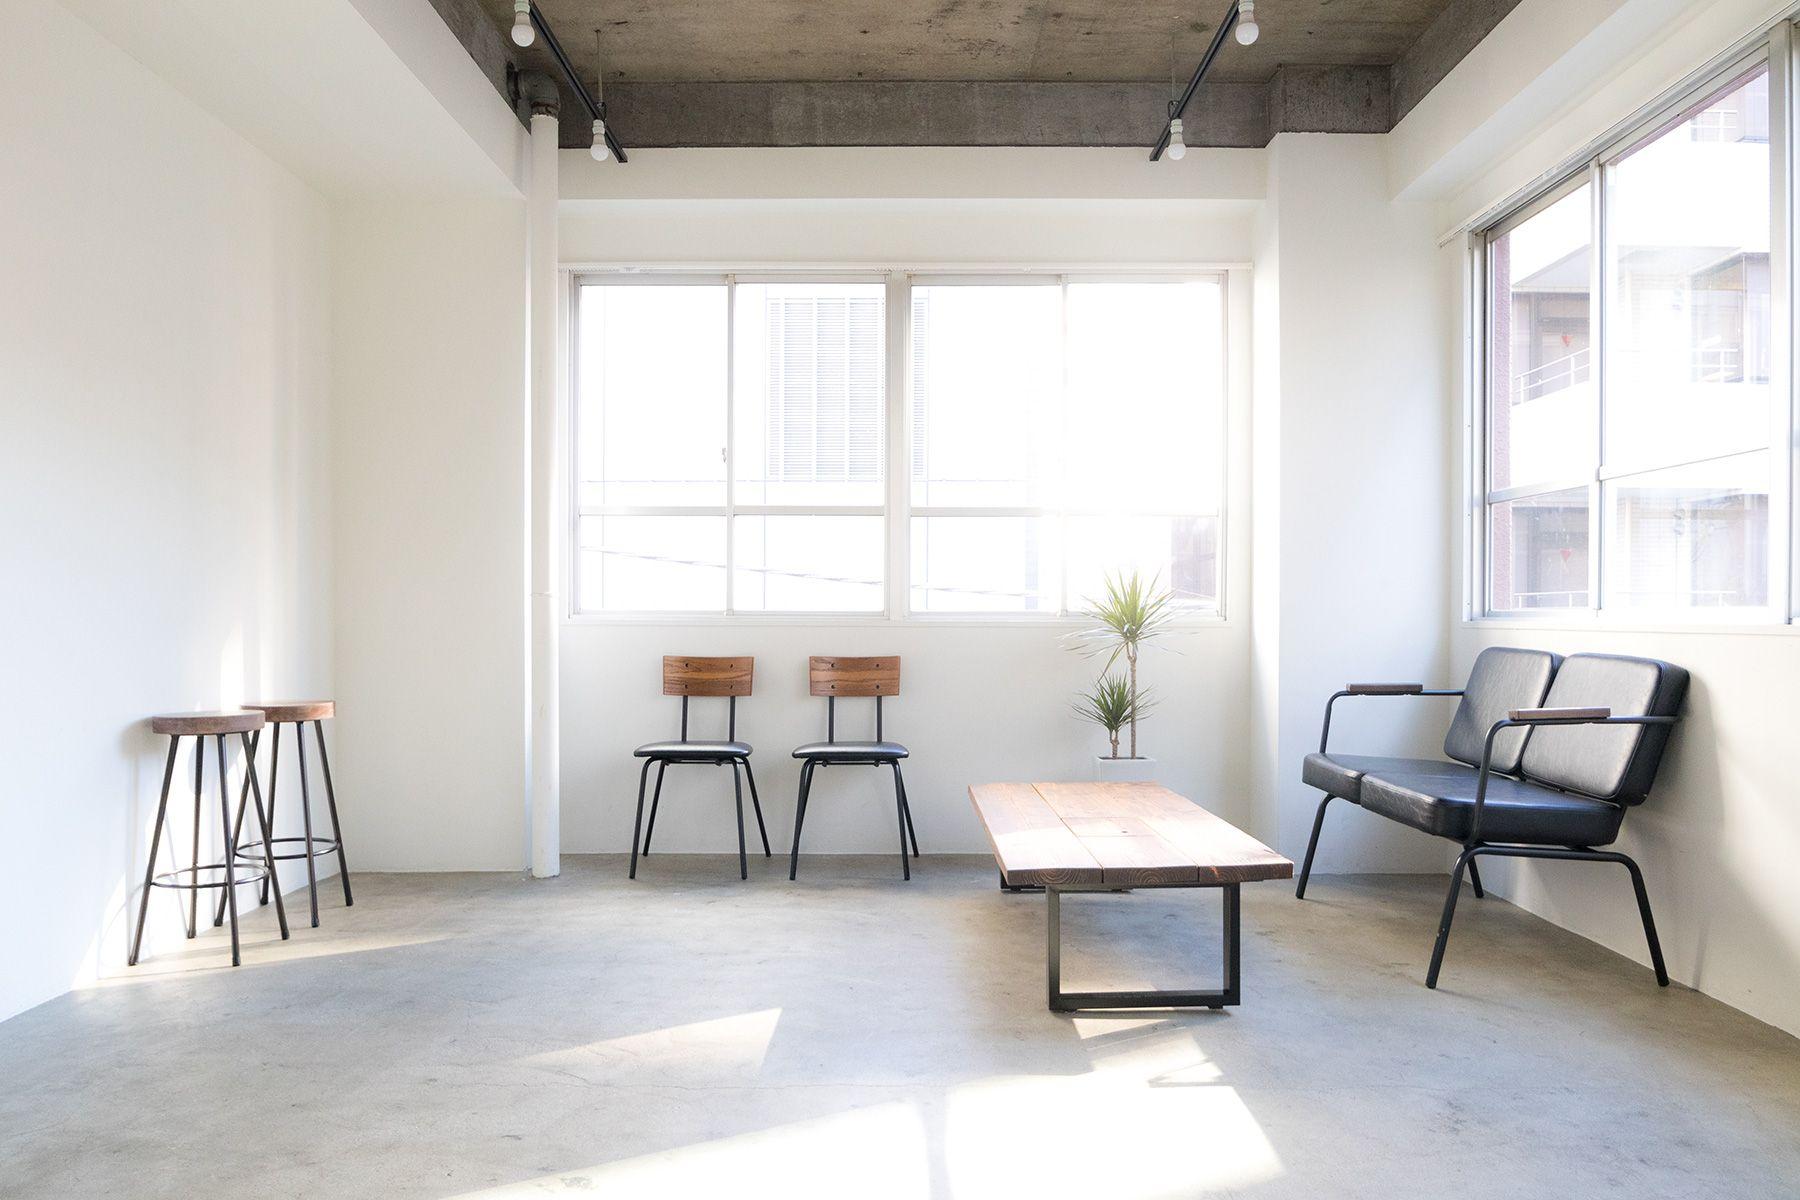 Studio Serato 水道橋 (スタジオセラート水道橋)抜かれた天井とモルタル床